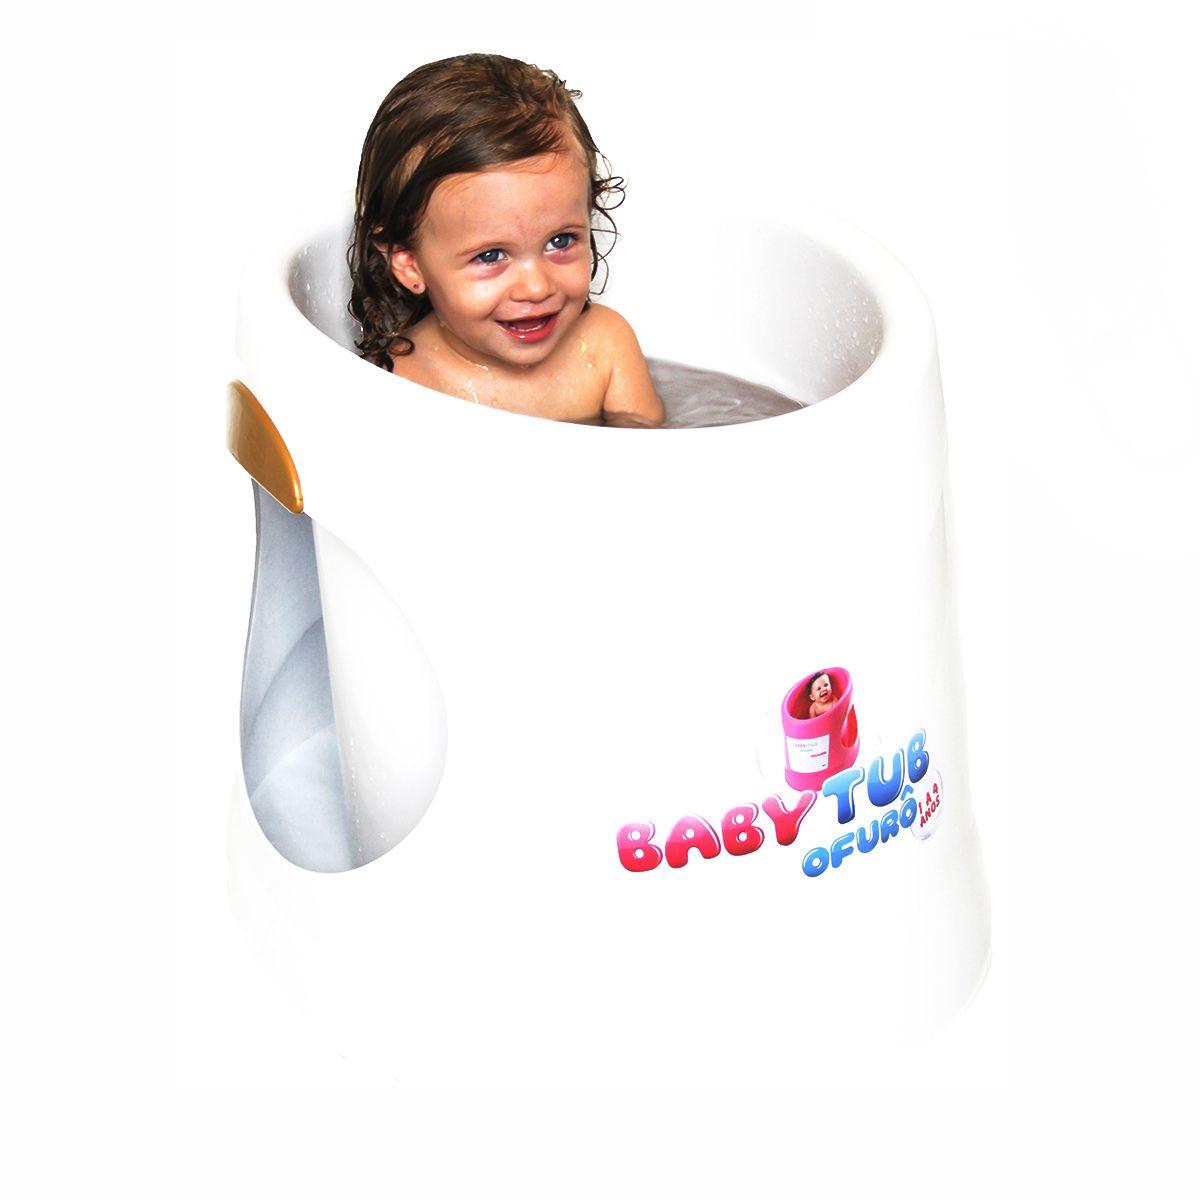 Banheira Ofurô Branca - Baby Tub